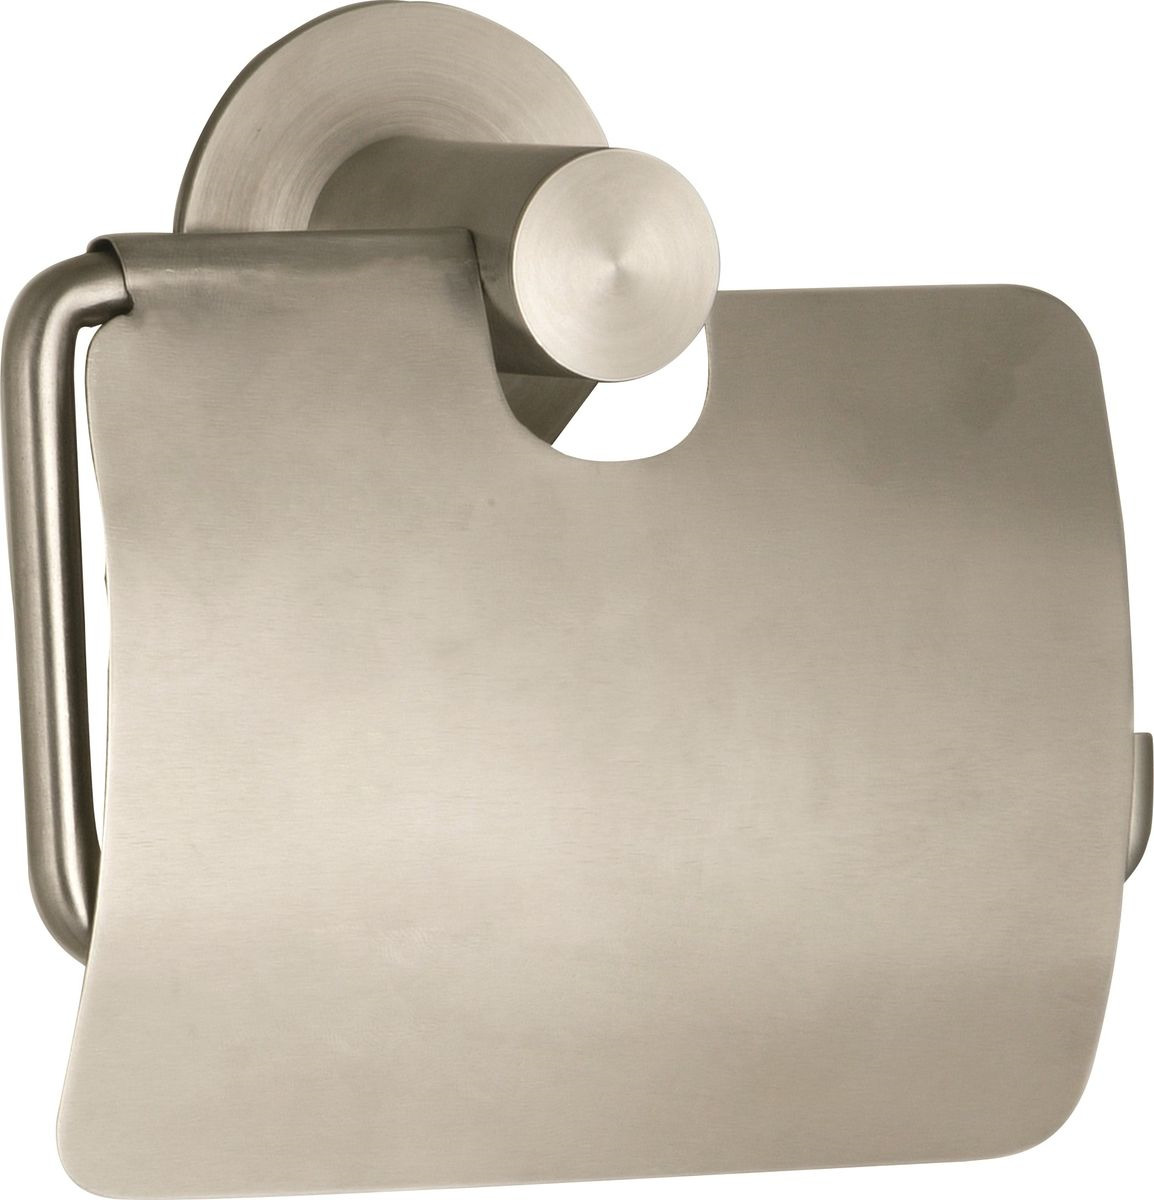 Держатель для туалетной бумаги MSV Siwa, 140211m, серебристый140211m140211m SIWA Держатель для туал.бум., настенн., 13 x 13 x 5.5 см, нерж. ст.